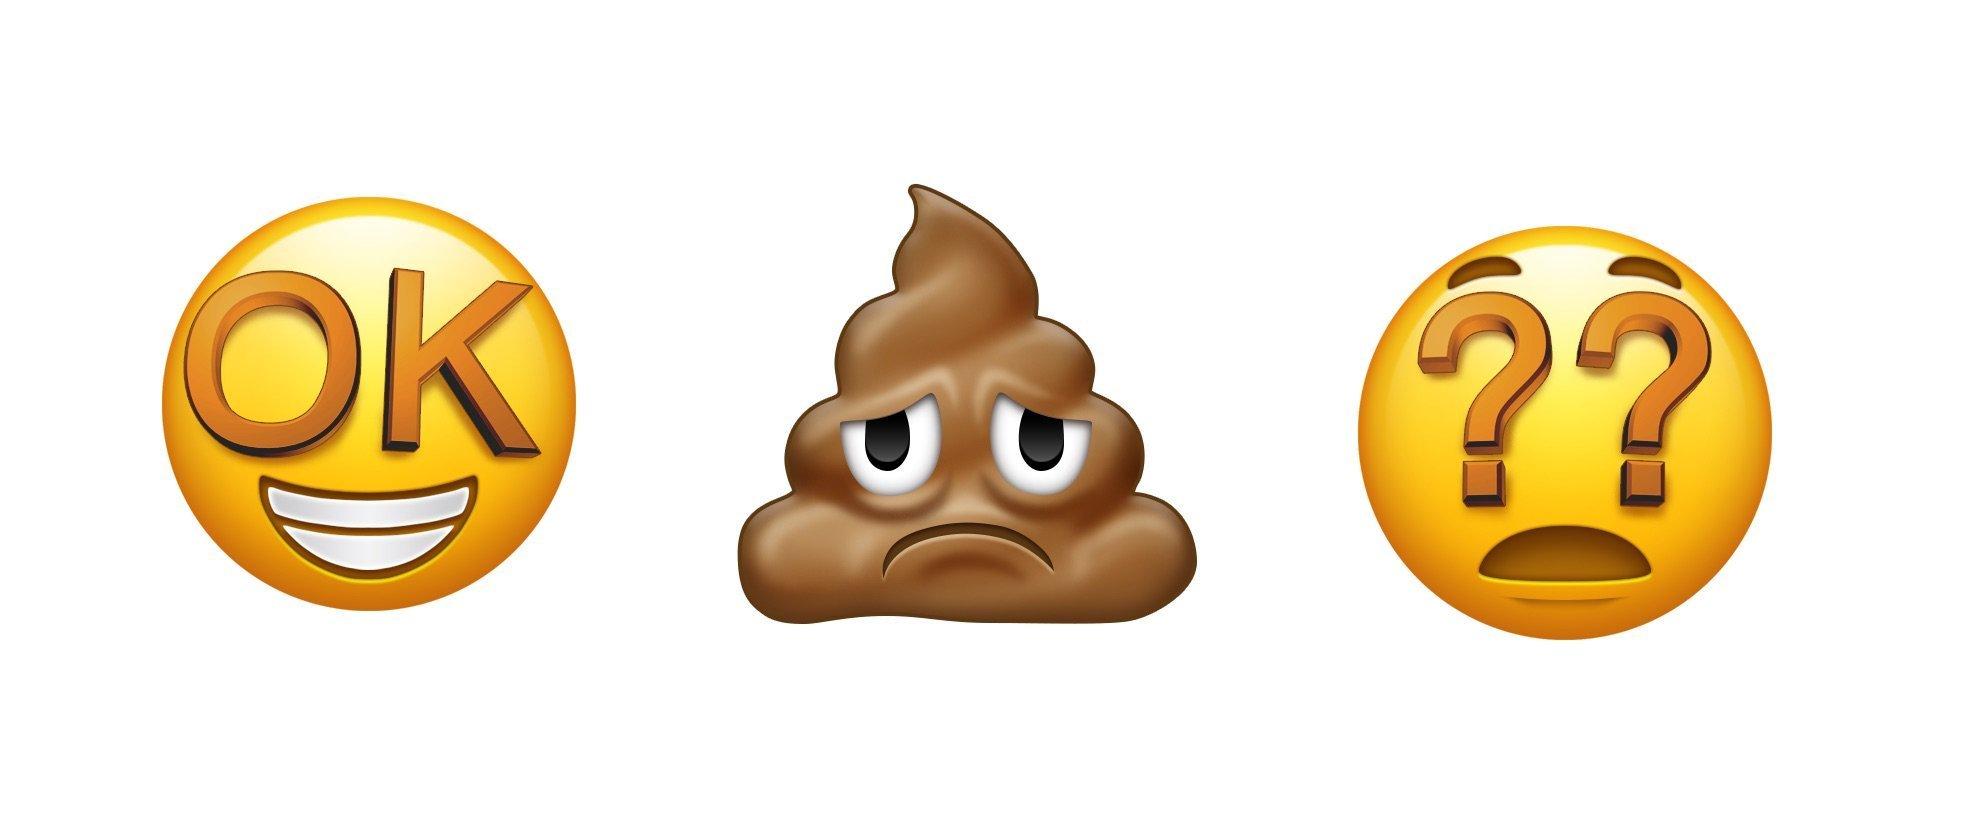 Emojis Of 2018: Bagels, Kangaroos, Redheads Are In